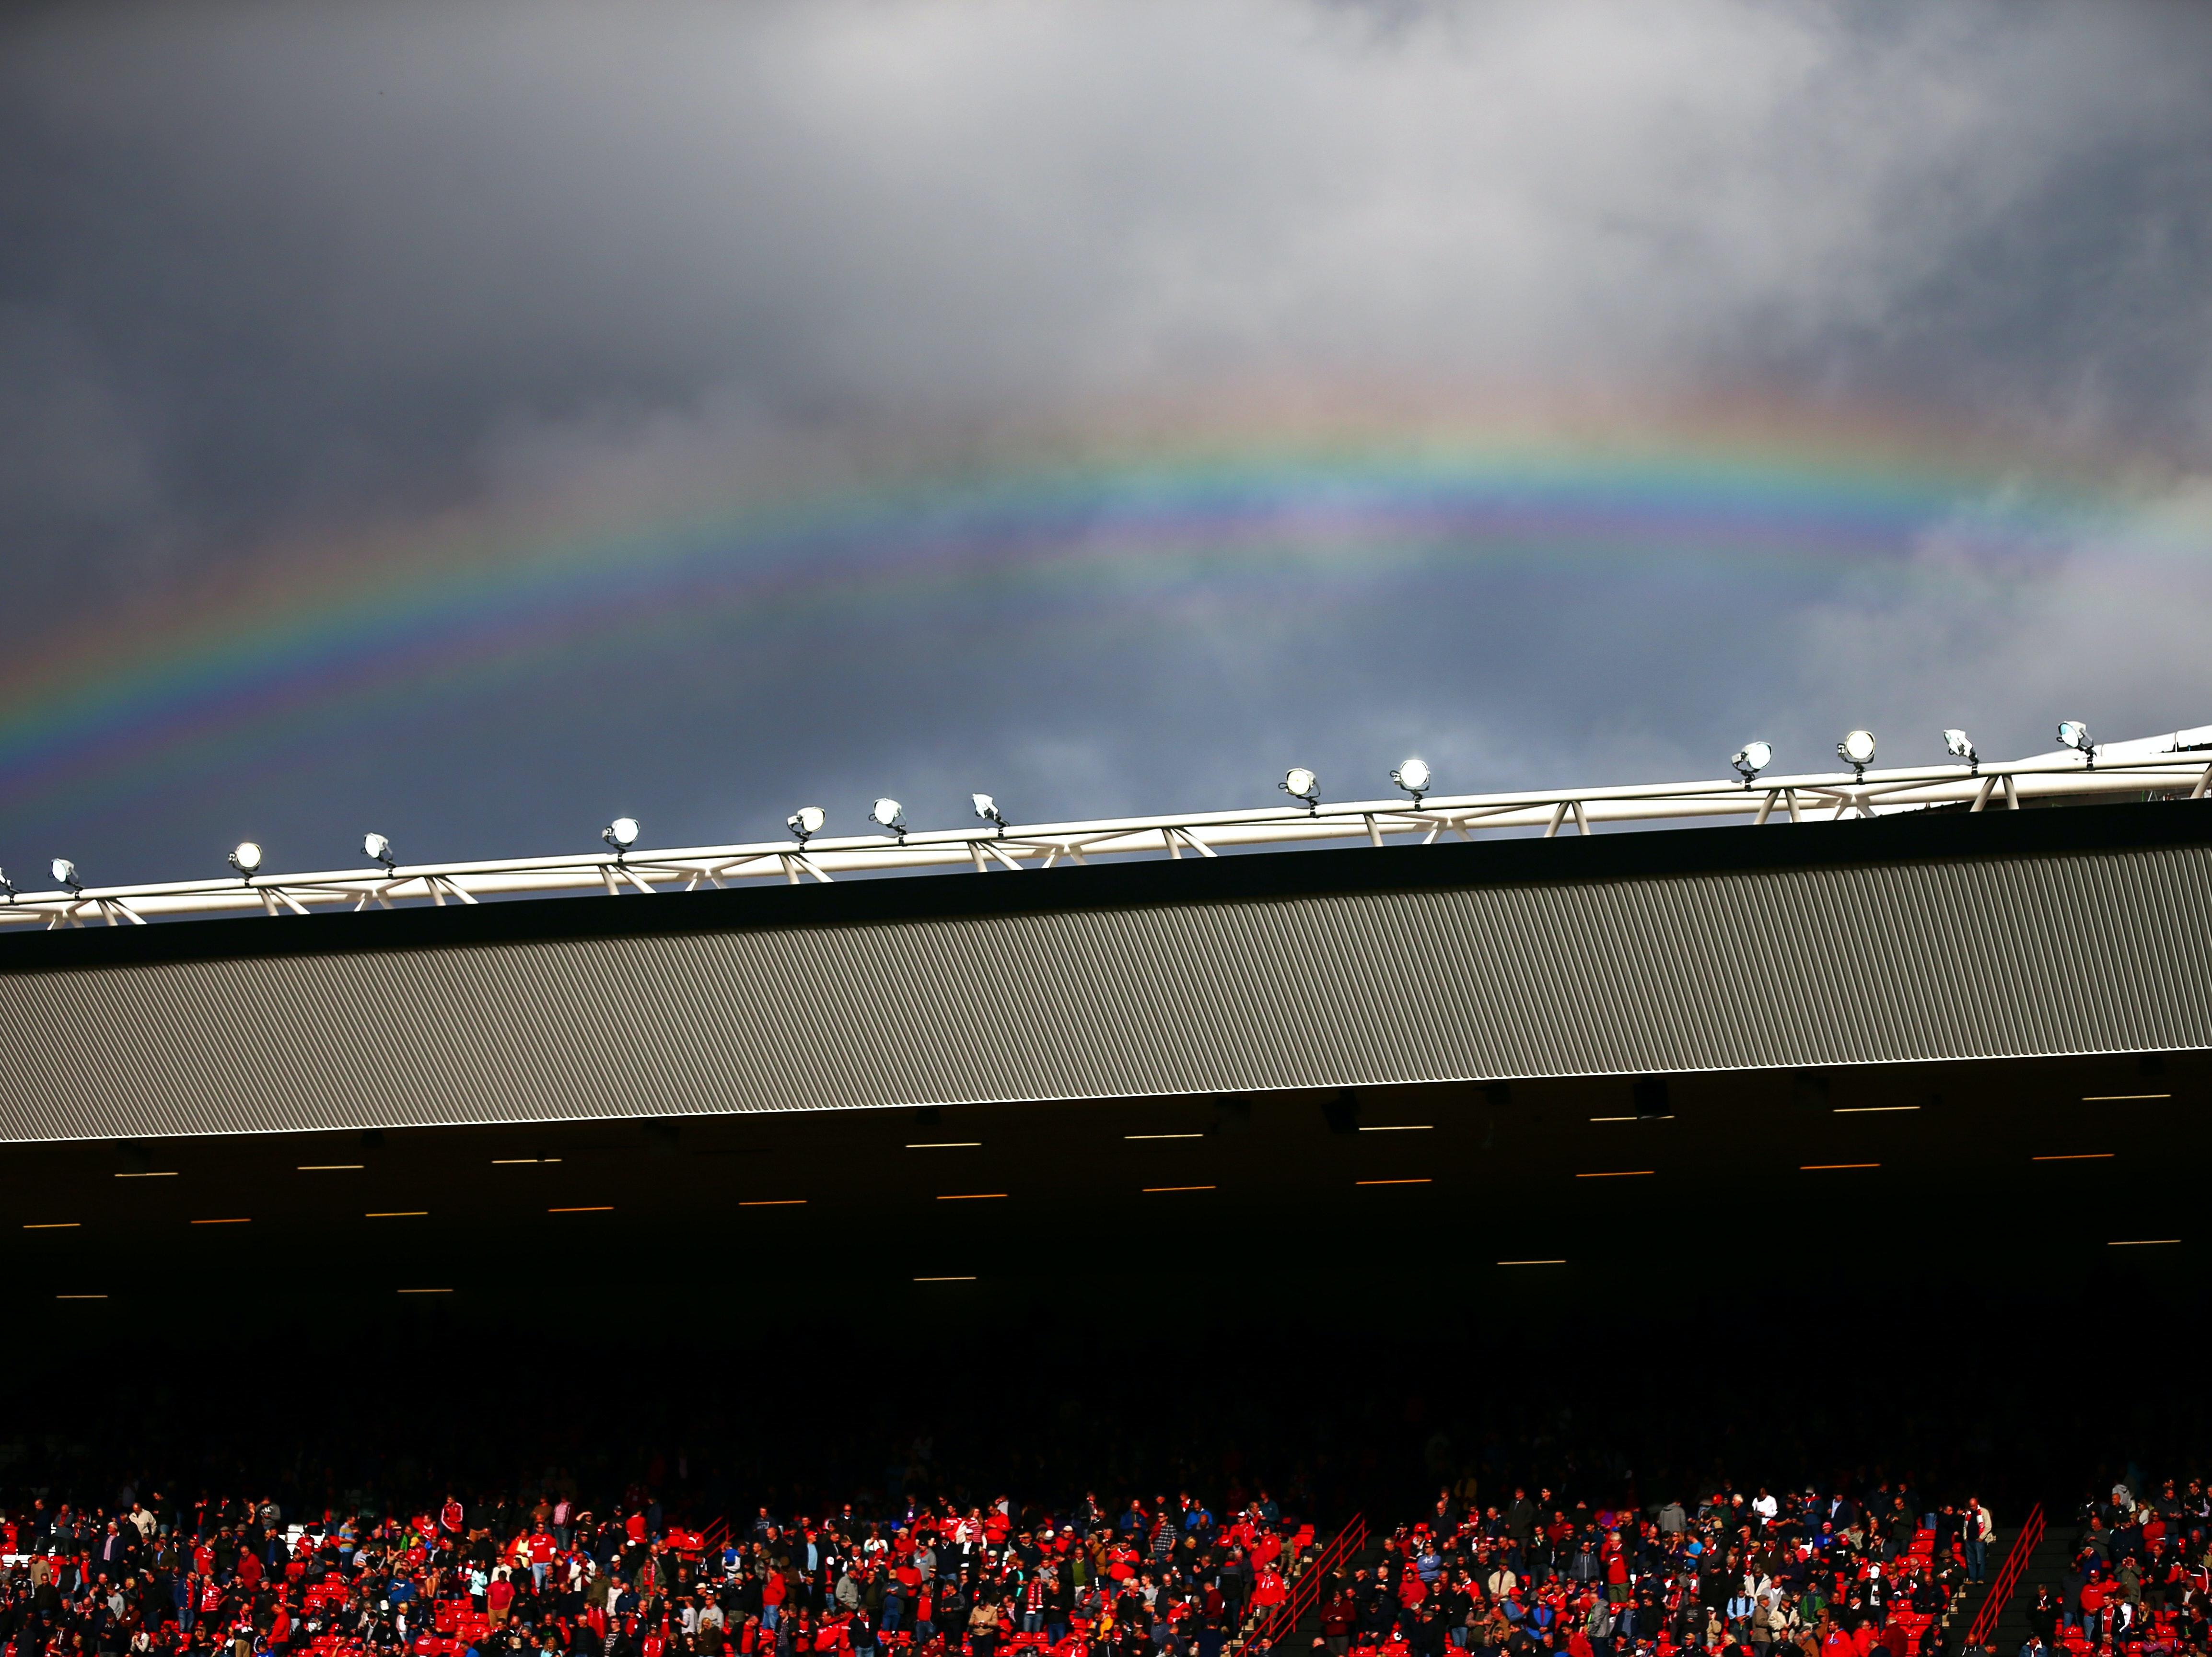 A rainbow forms over Bristol's Ashton Gate stadium.